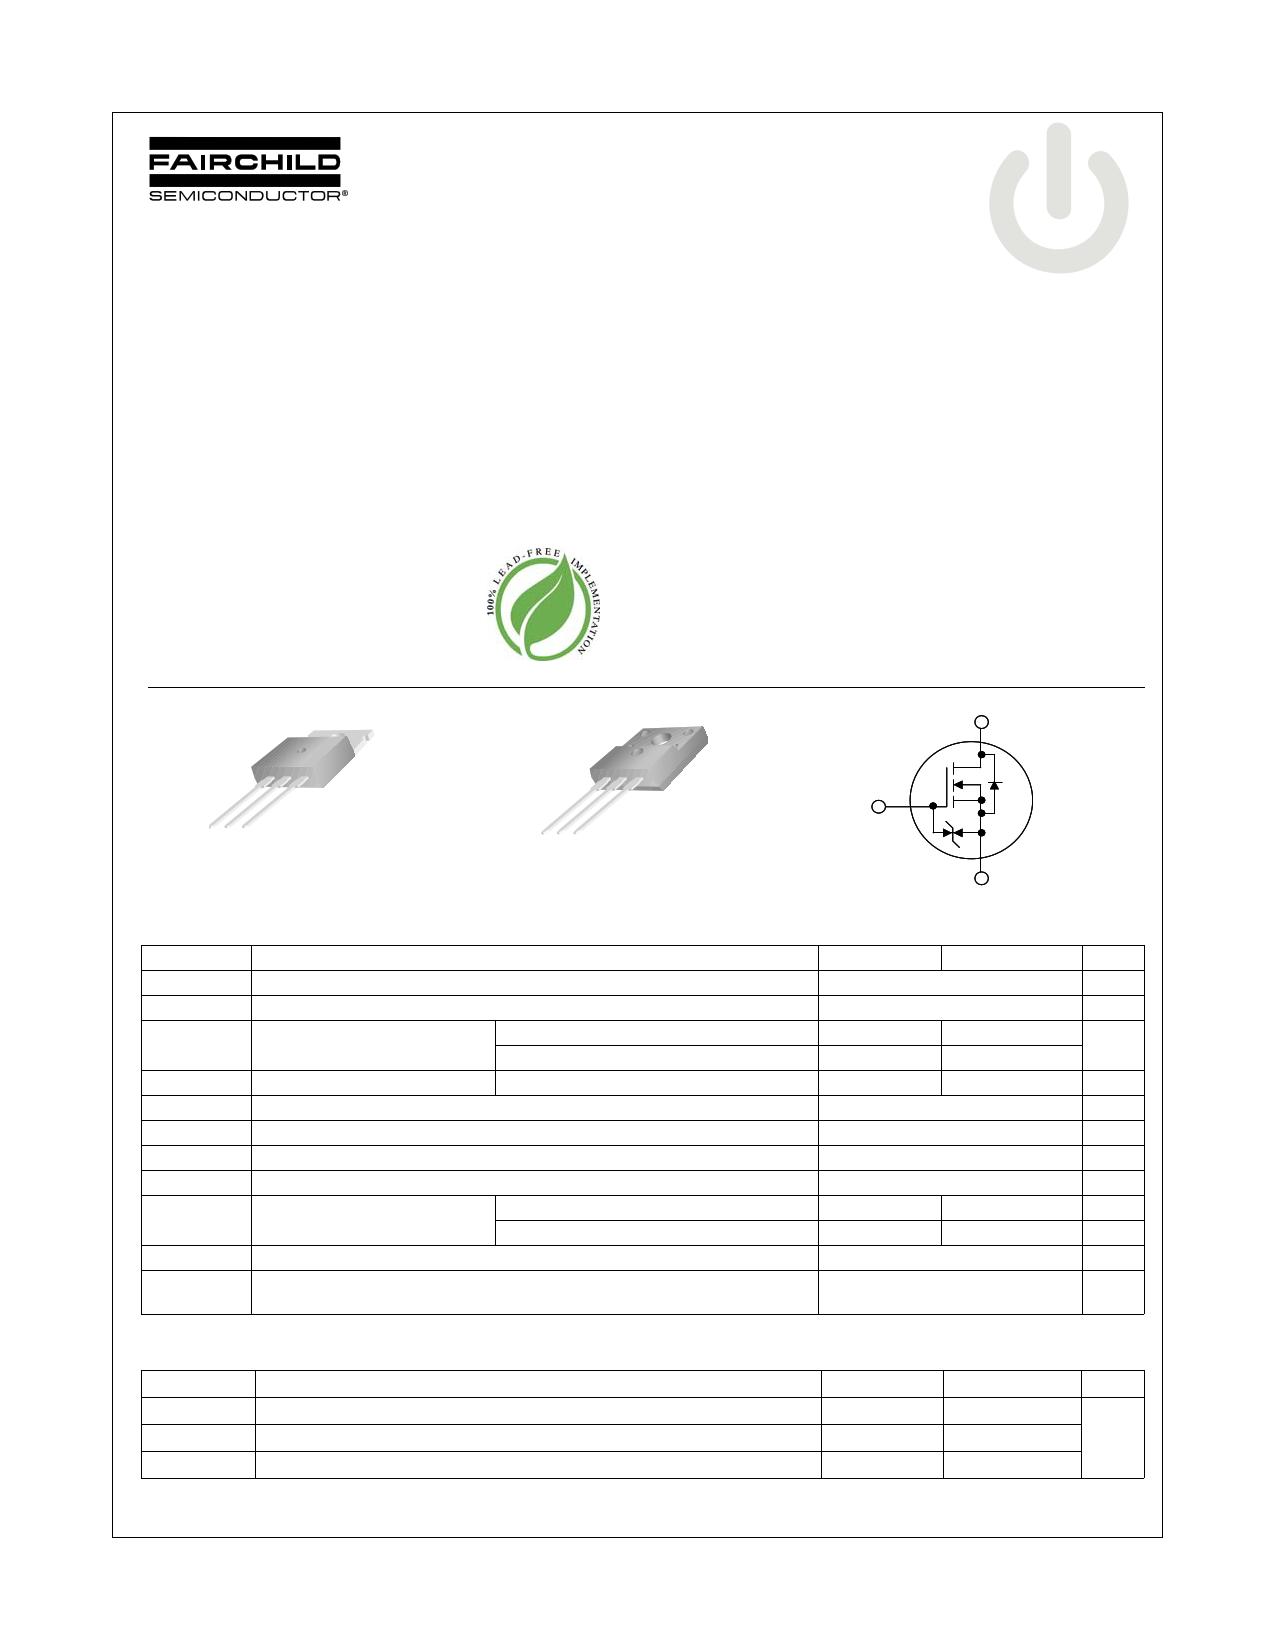 FDP10N60ZU 데이터시트 및 FDP10N60ZU PDF